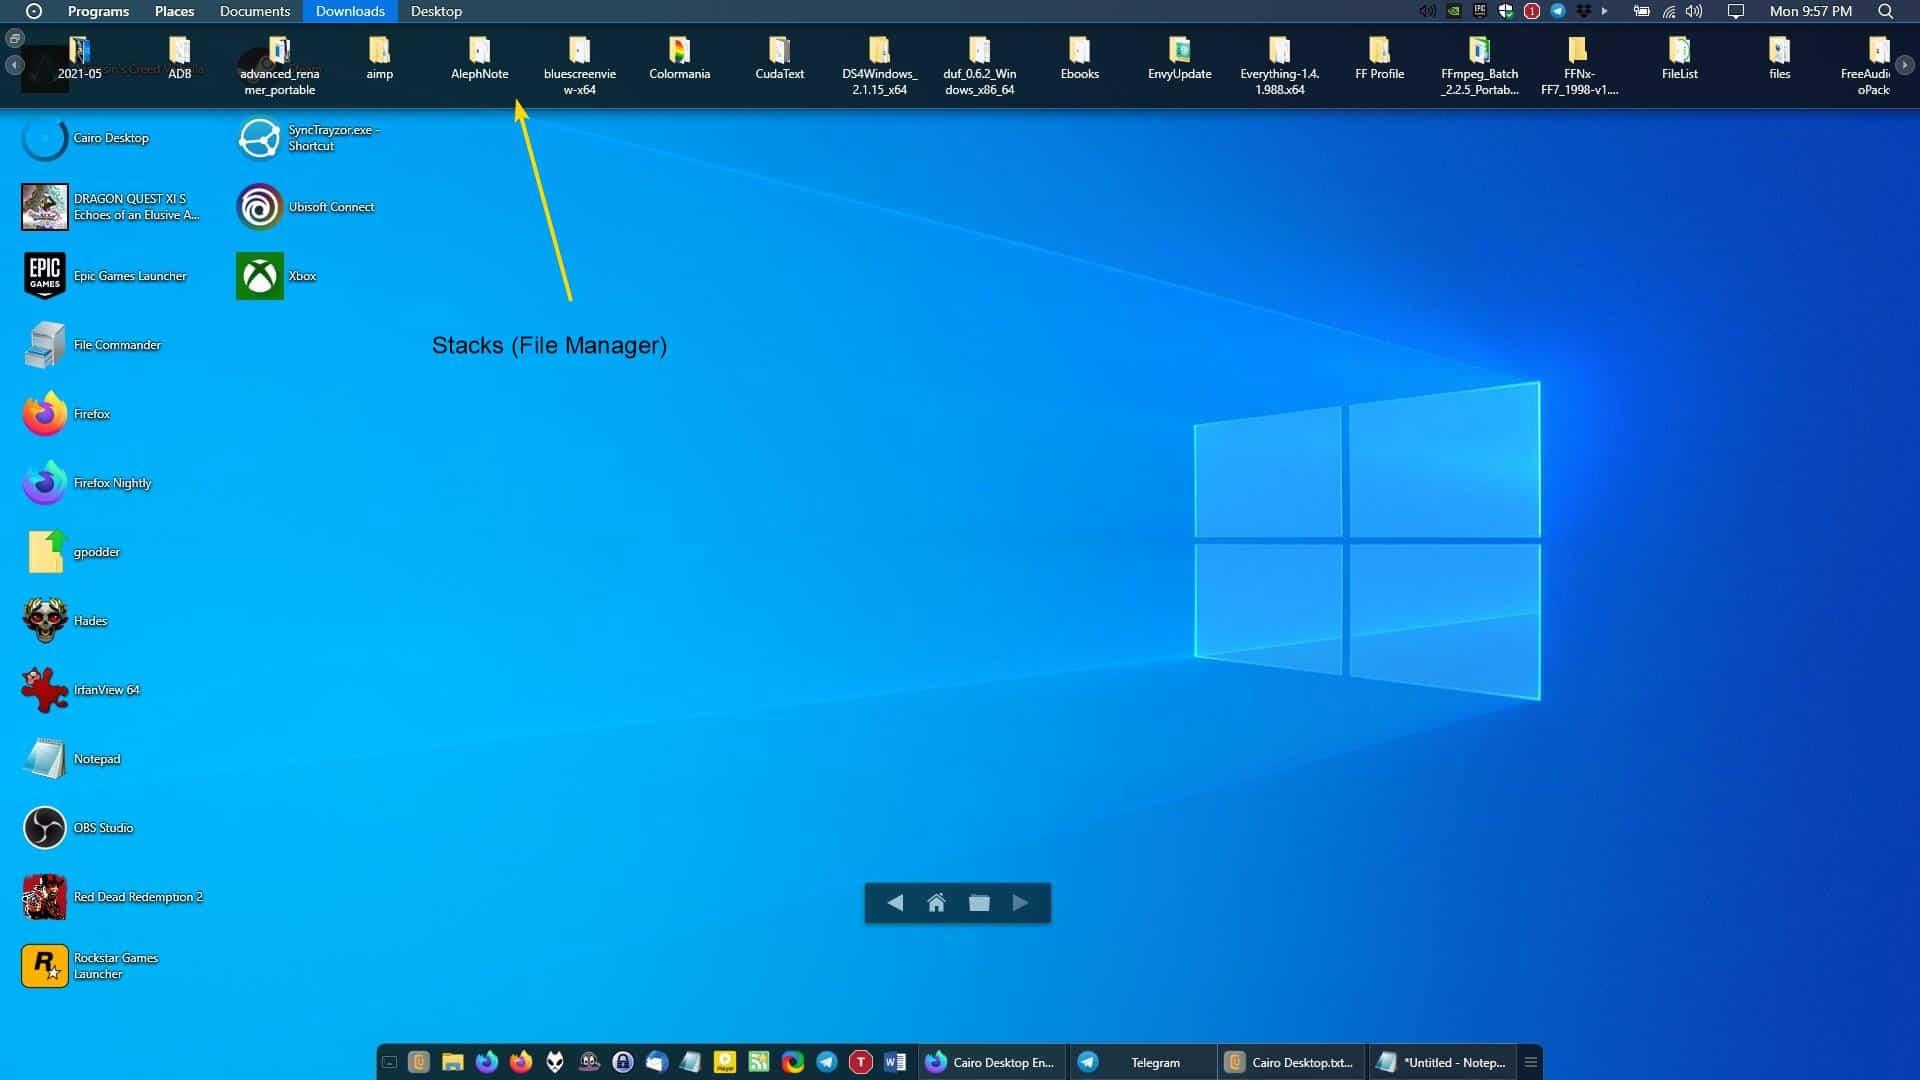 Cairo Desktop - Stacks file manager - browse folders